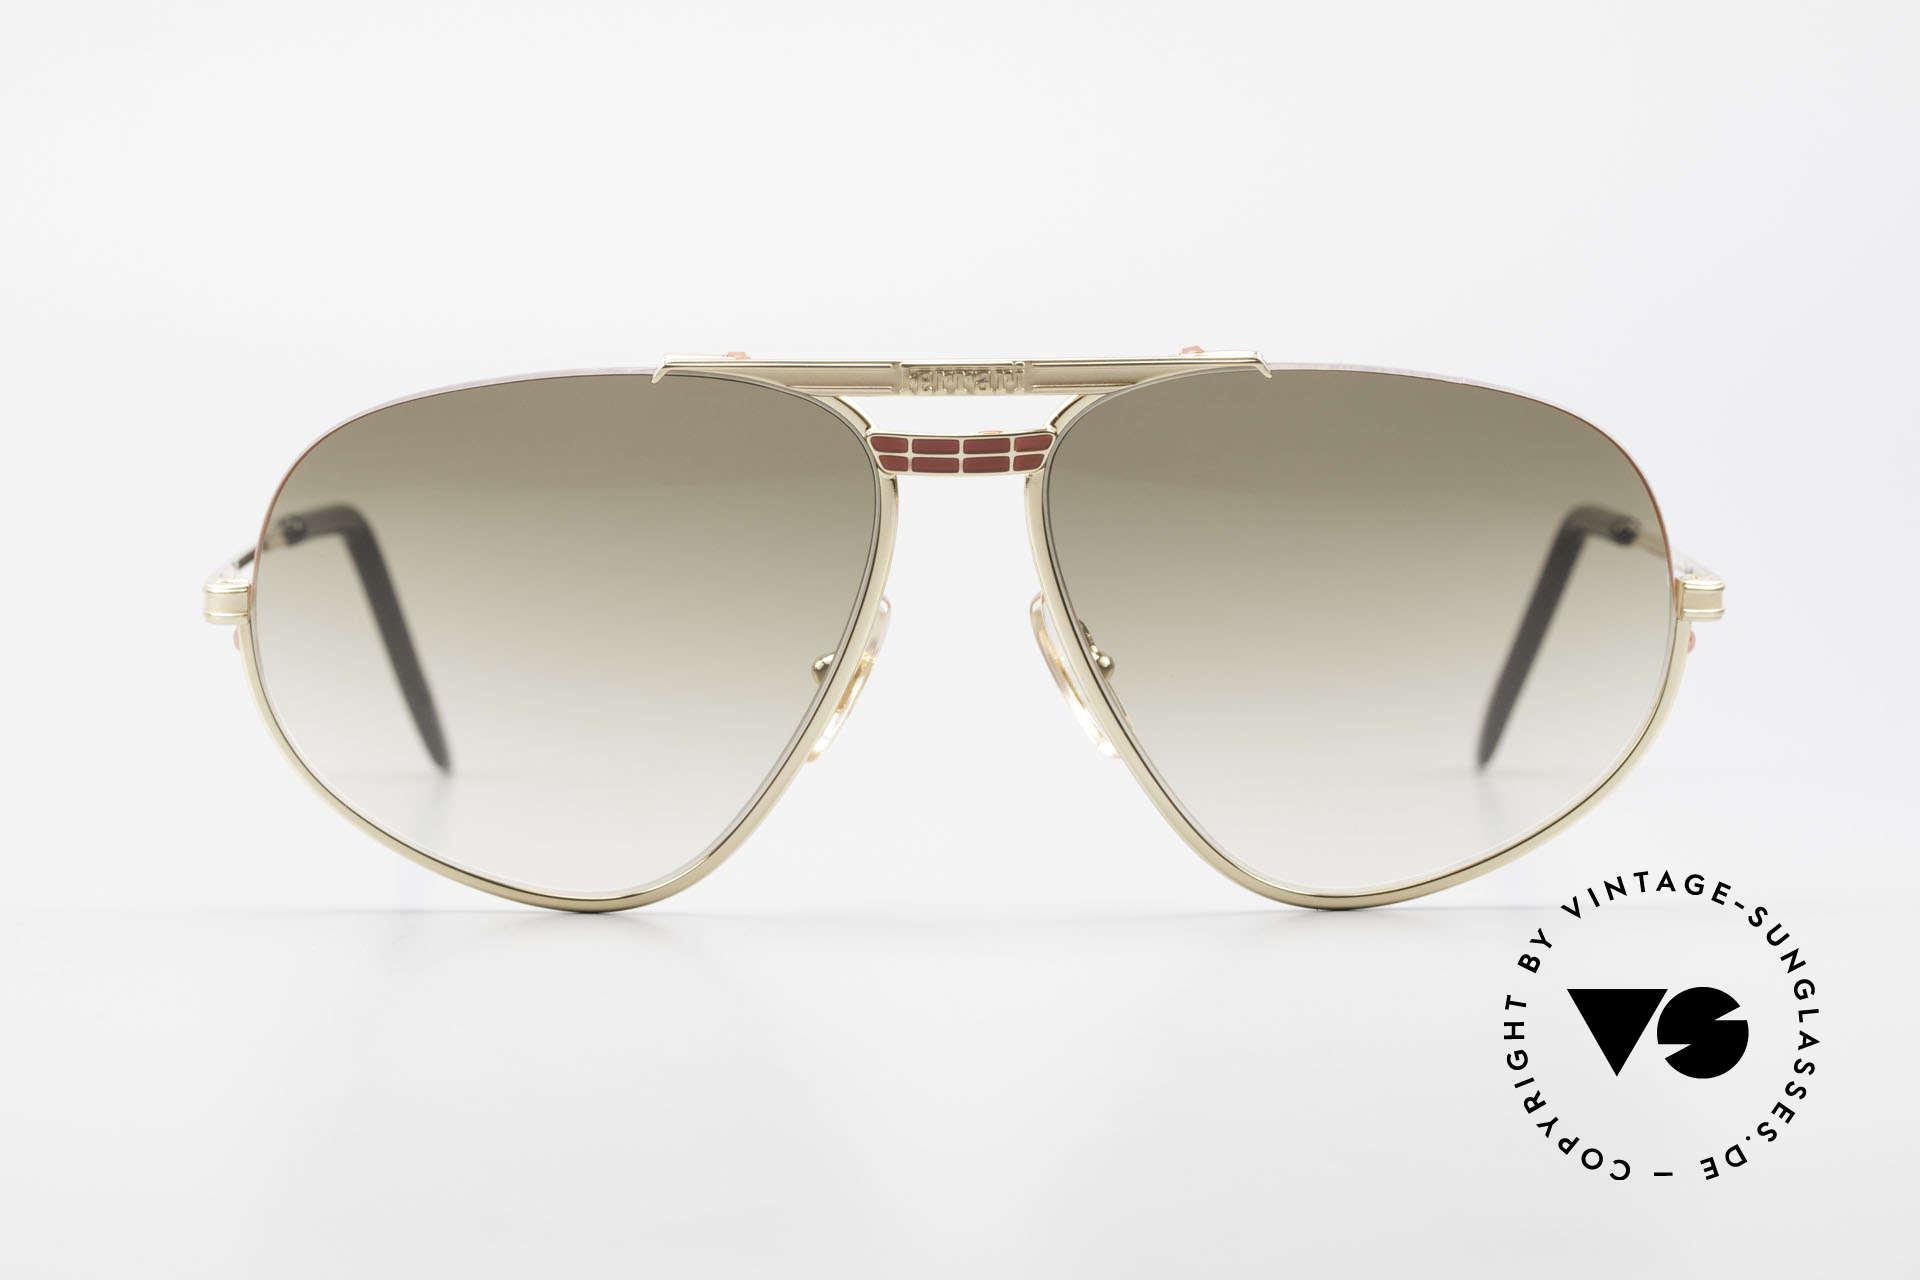 Ferrari F2 Ferrari Formula 1 Sunglasses, very interesting frame construction (semi rimless), Made for Men